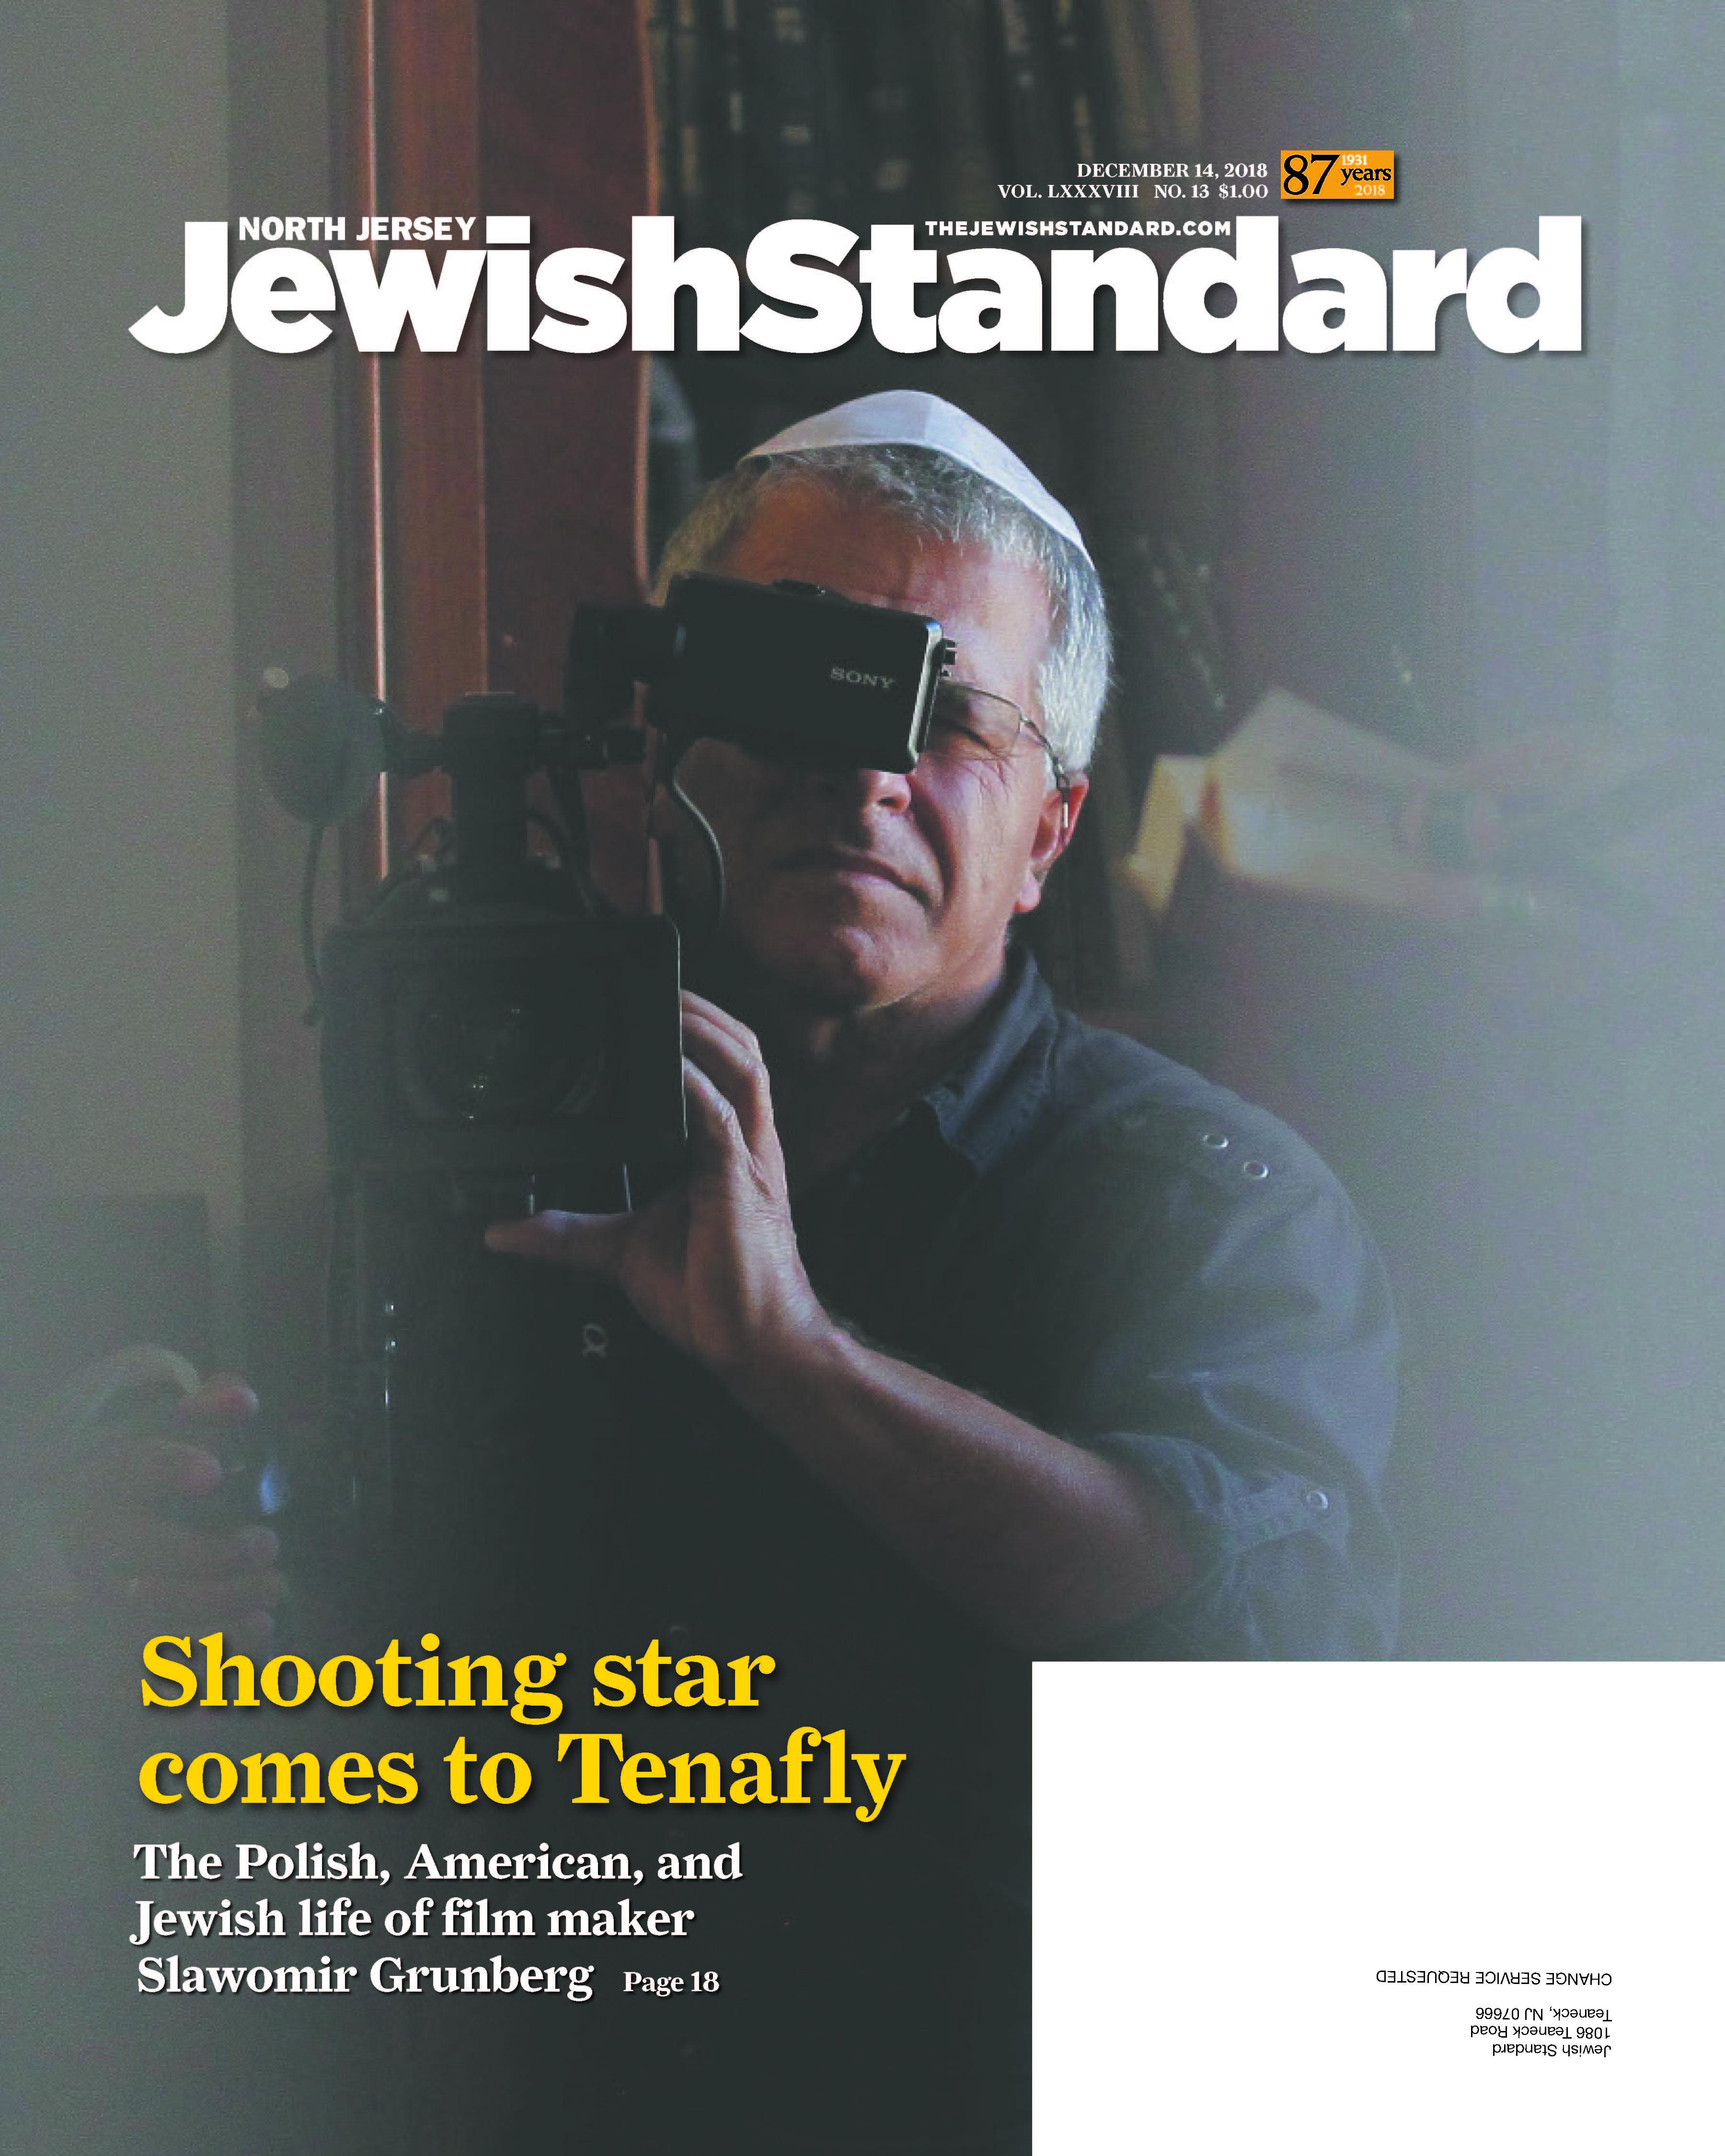 Jewish Standard, December 14, 2018